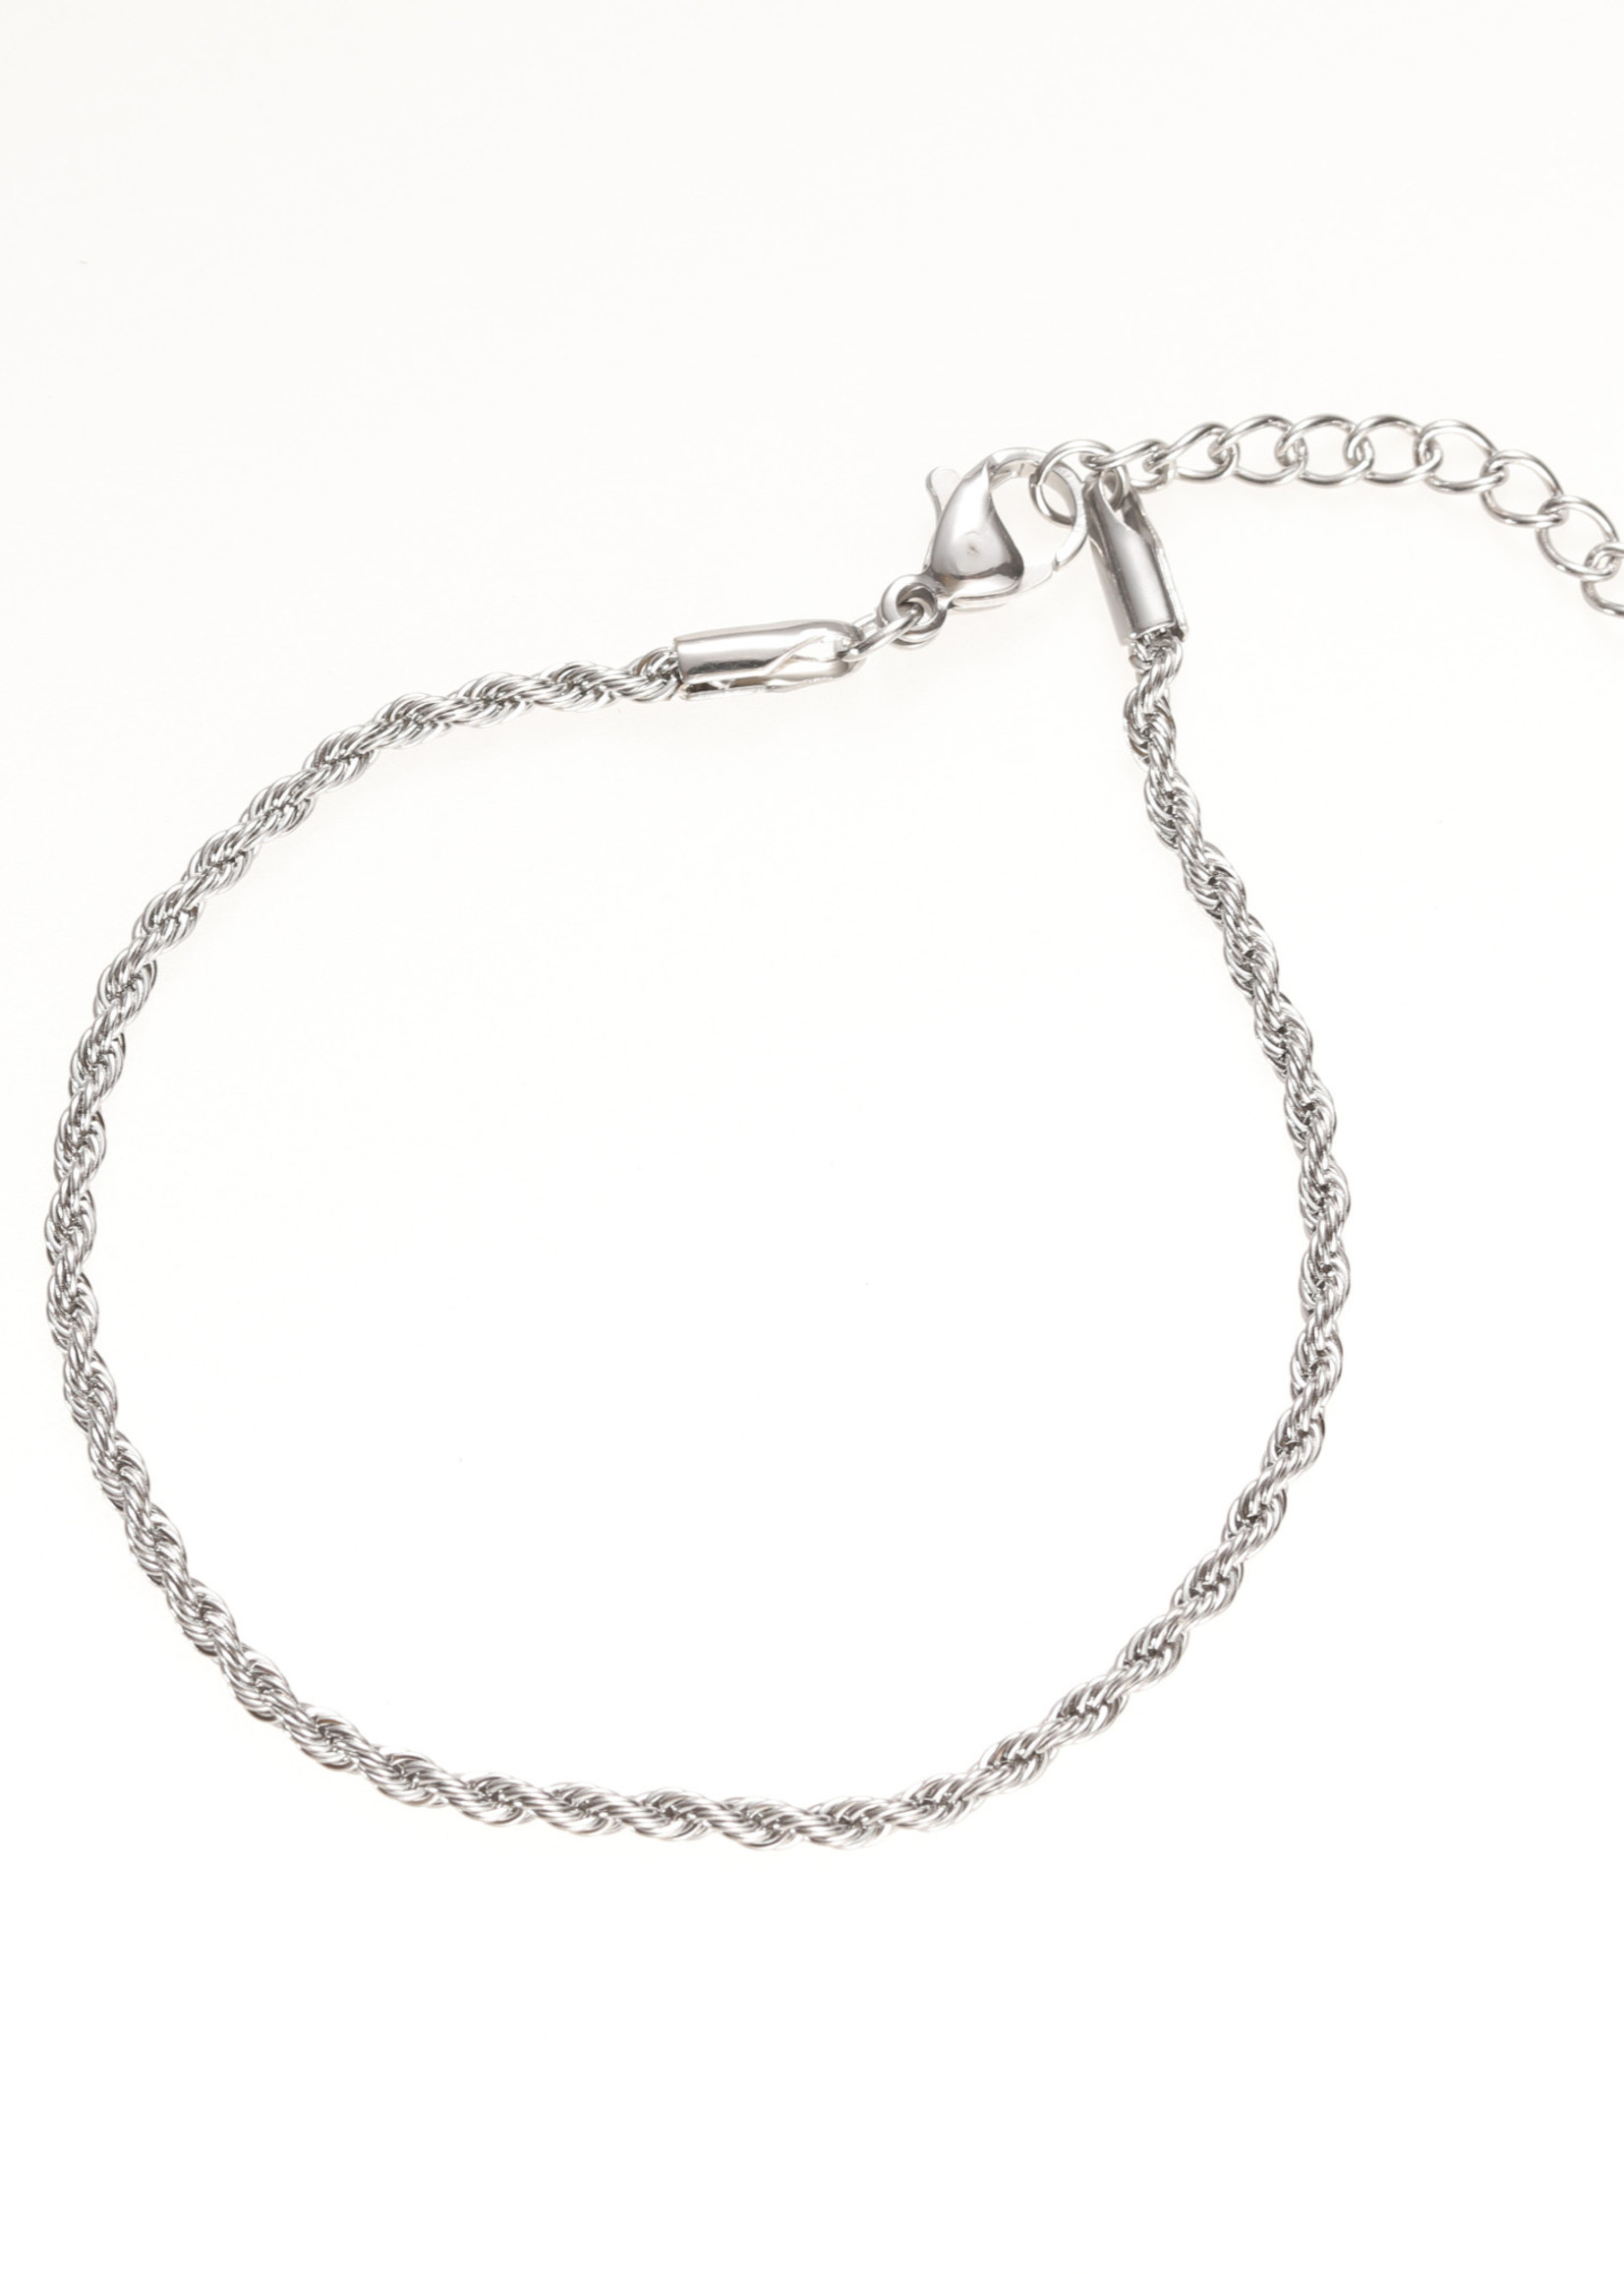 Armband zilver fijn gedraaid B1771-1